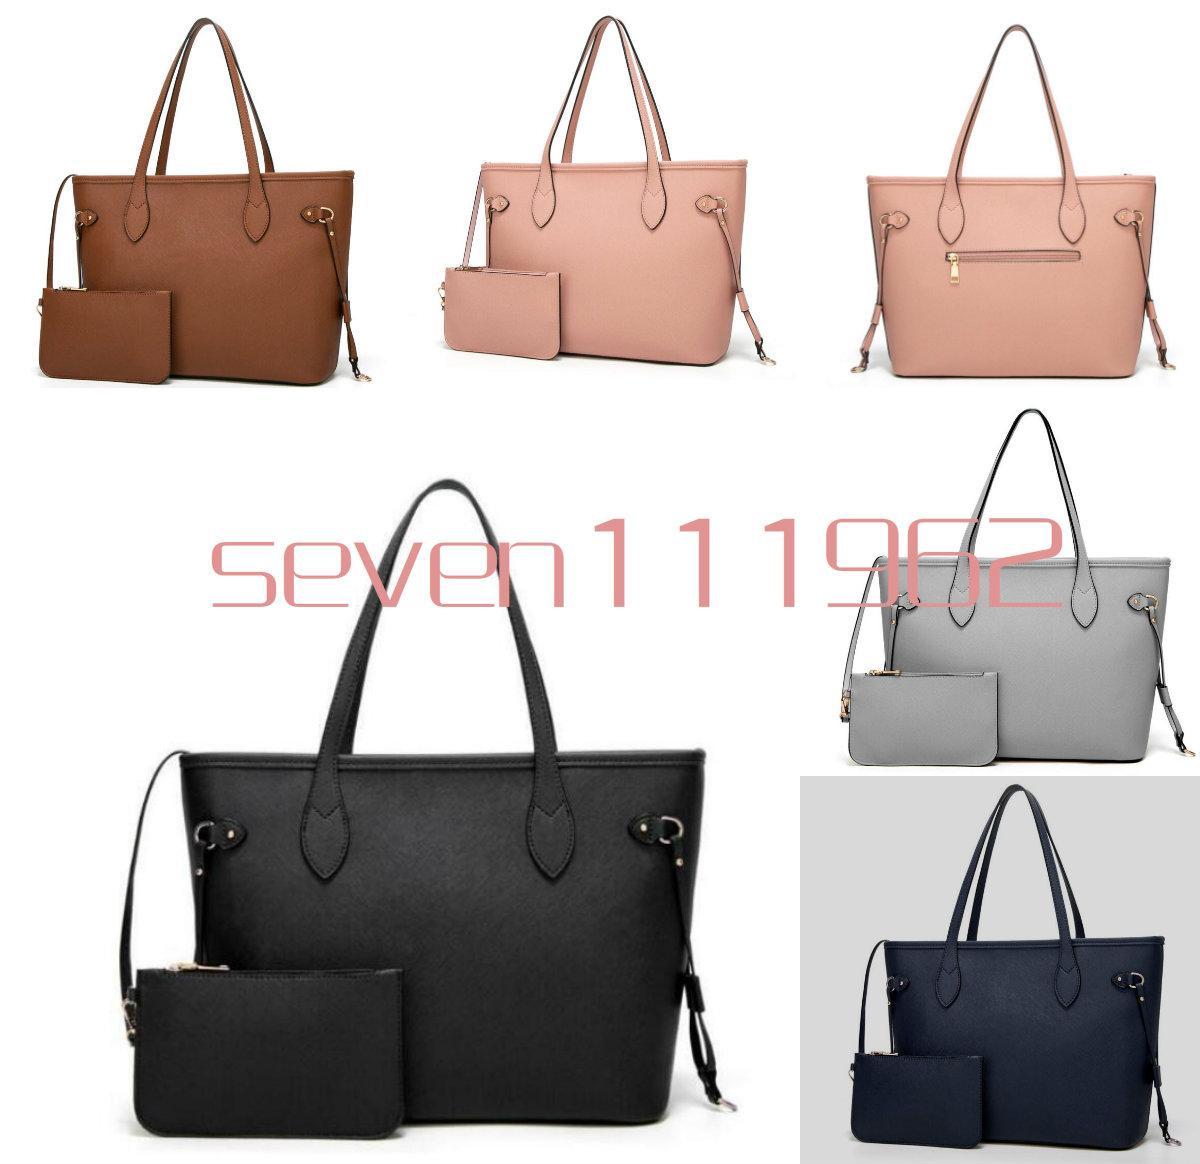 free shipping womens handbag designer shoulder bag High Quality bag for ladys and girls Fashion Bags hot sell Cross Body Totes 20621